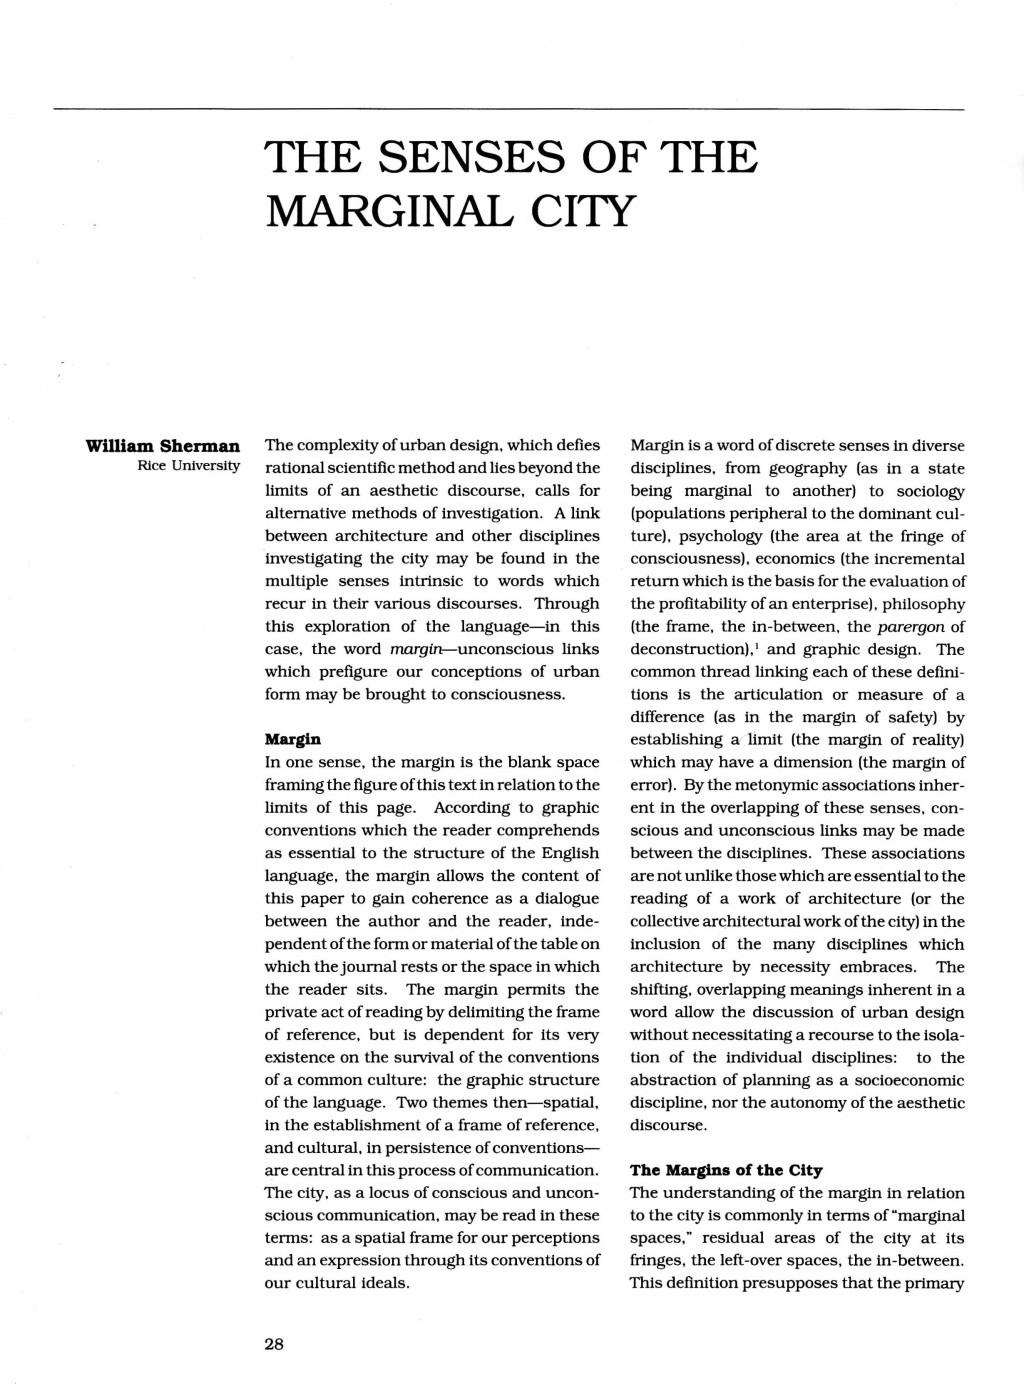 marginal0001